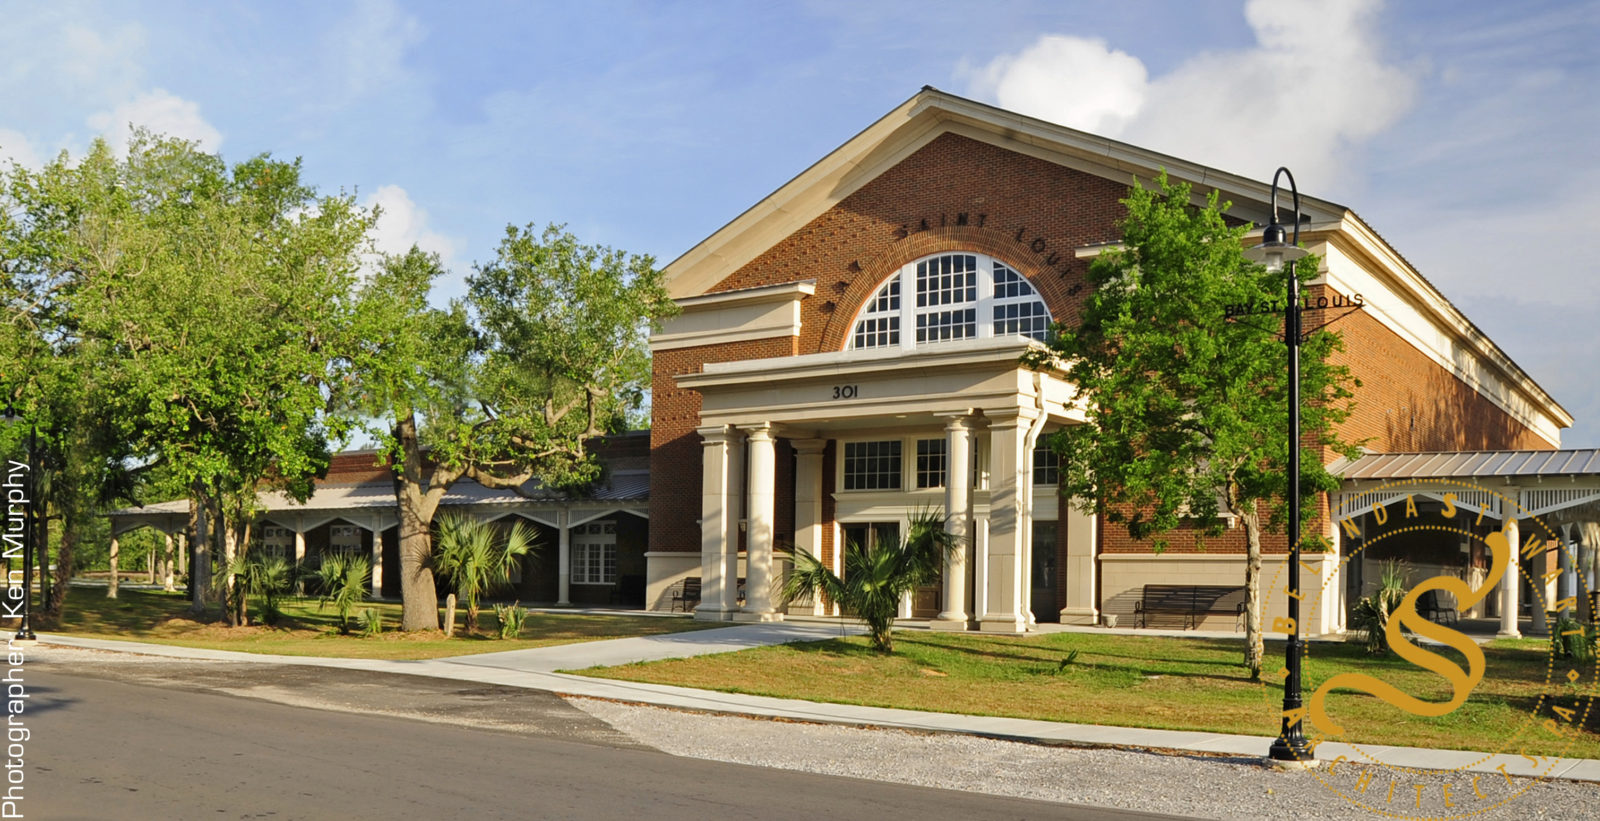 Bay St. Louis Community Hall